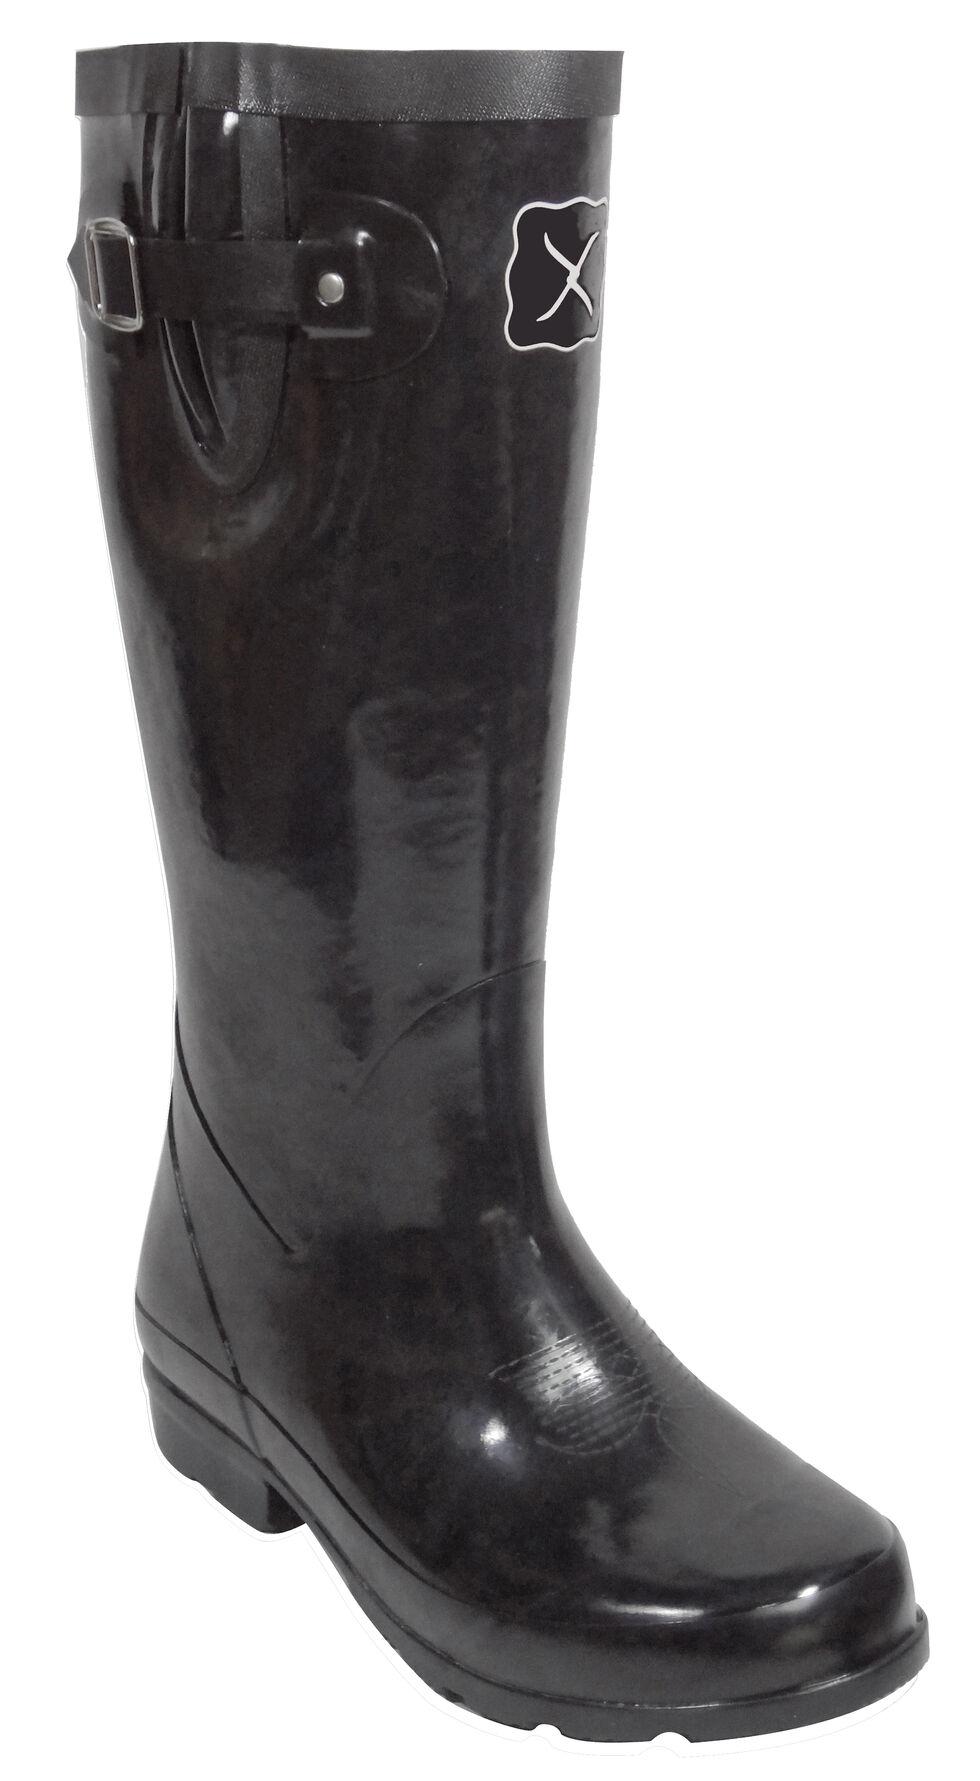 Twisted X Women's Black Mud Boots, Black, hi-res